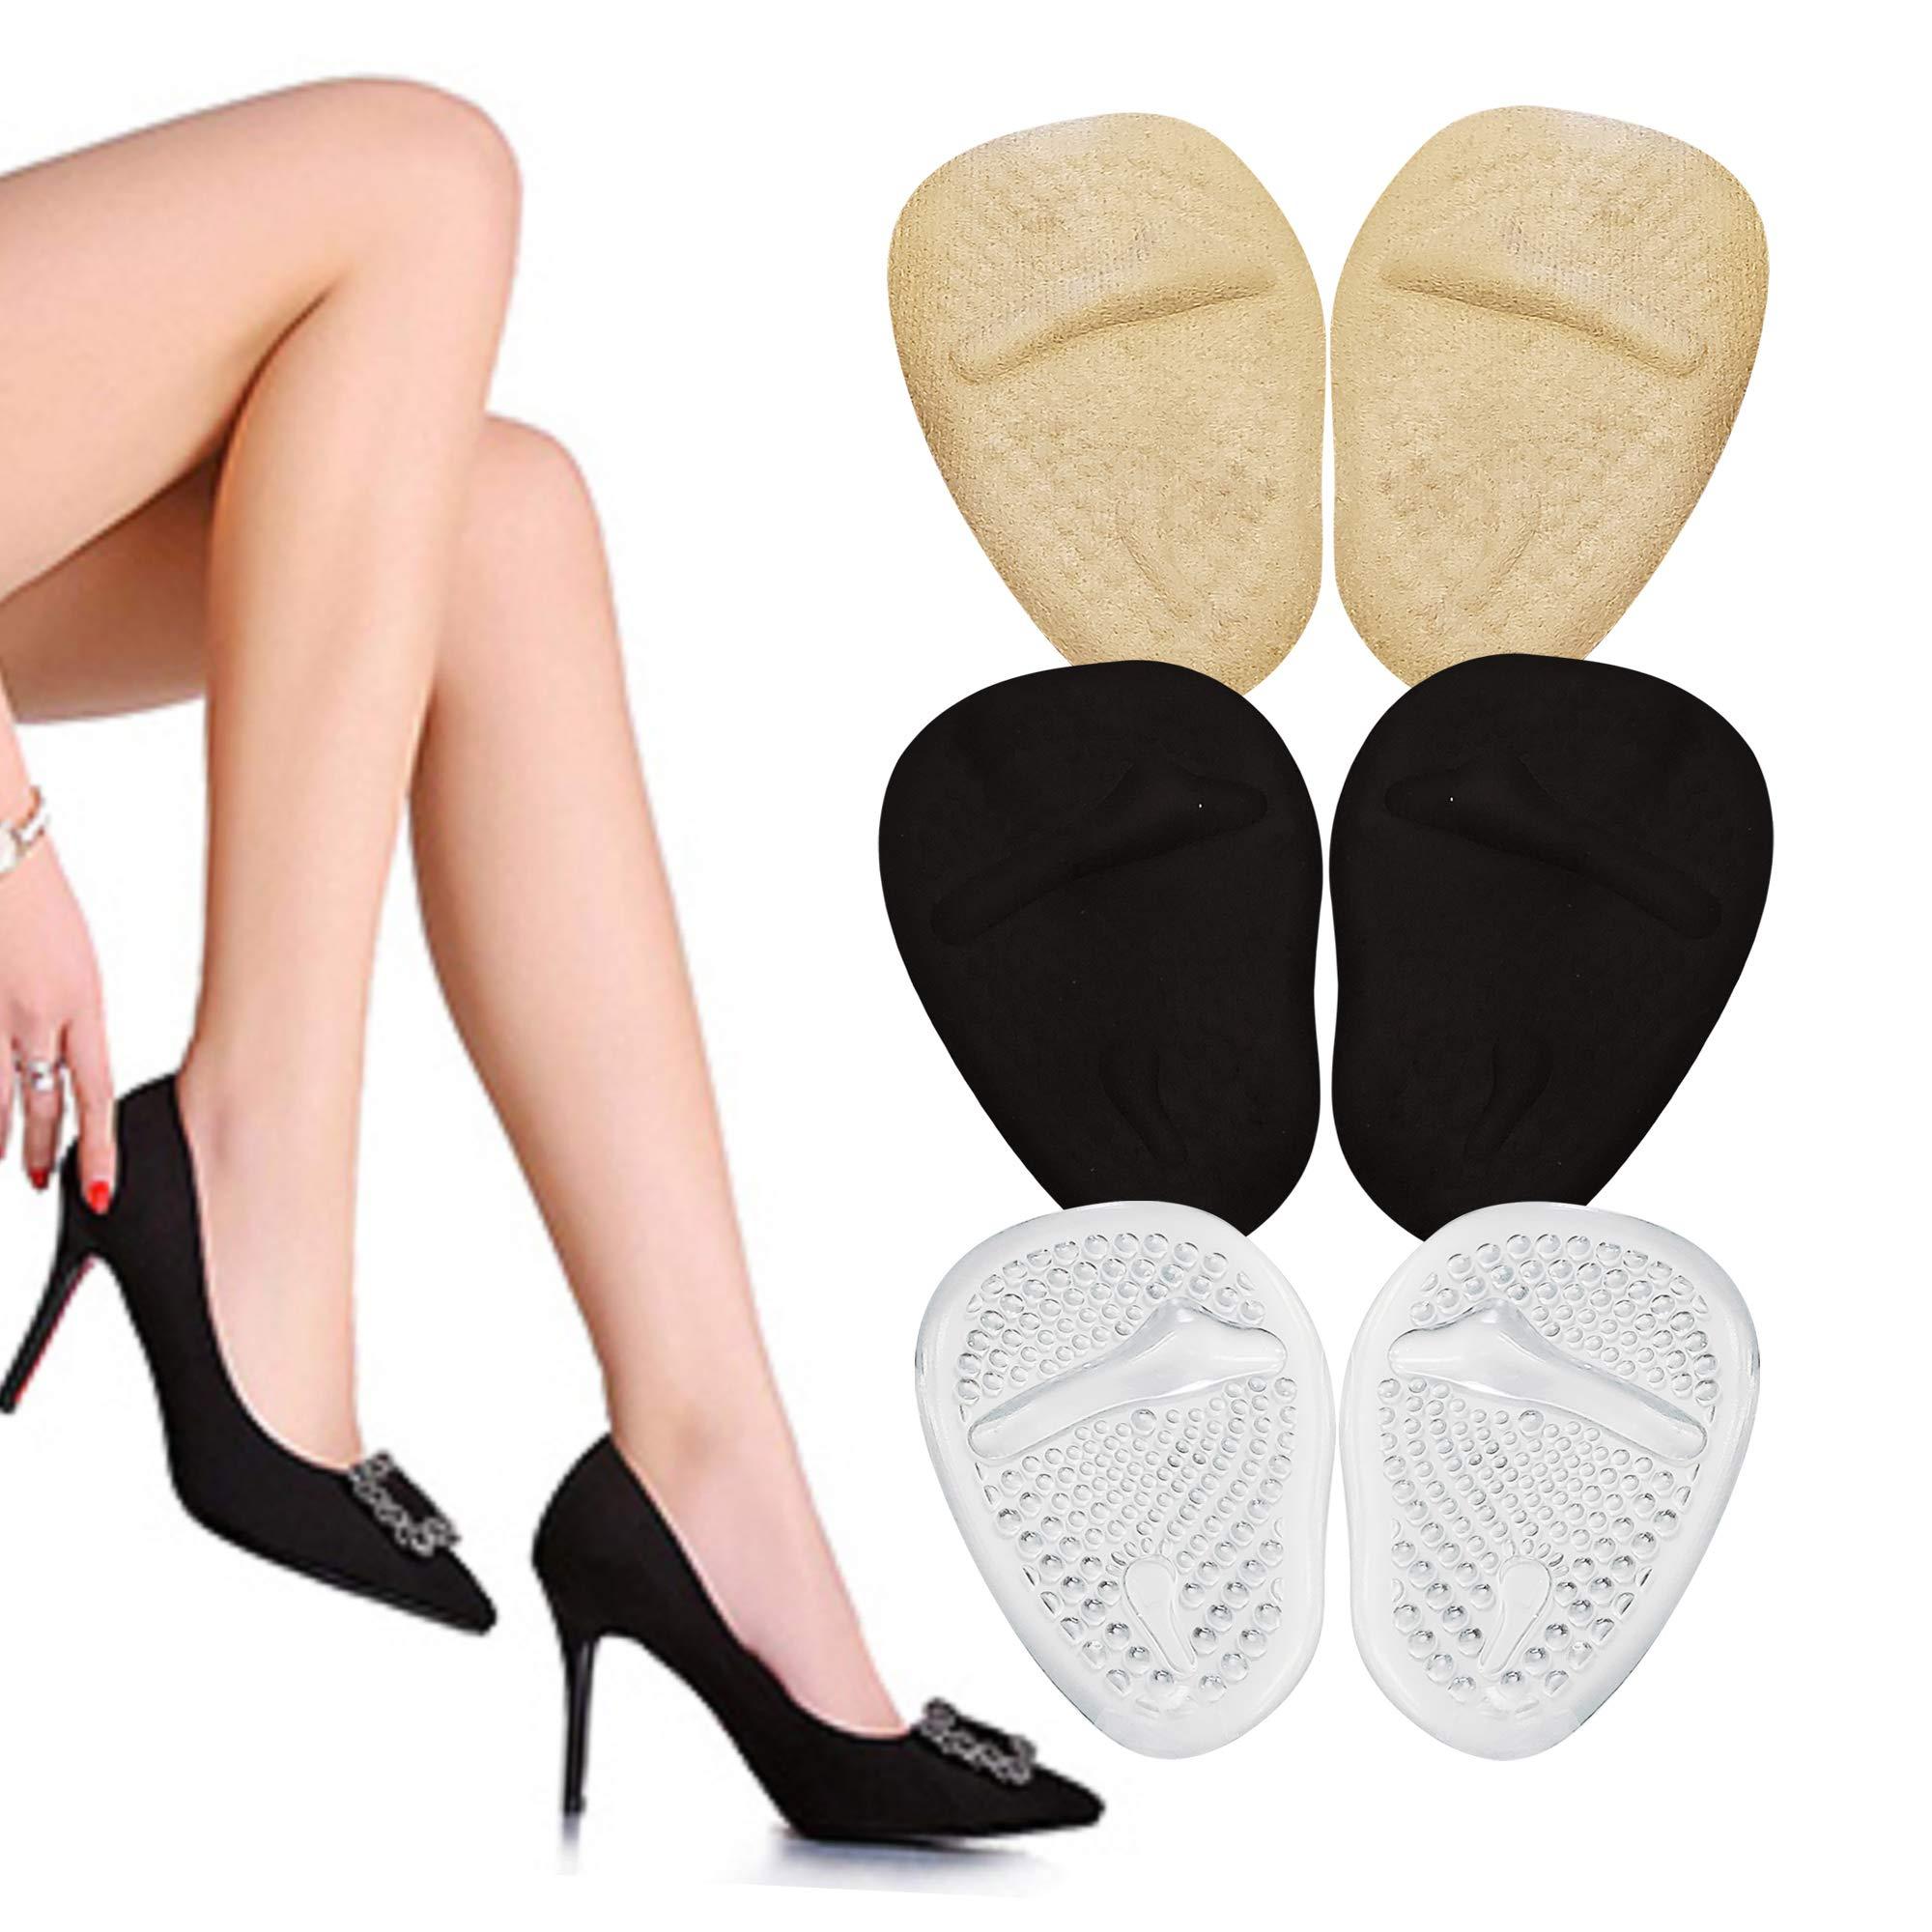 High Heel Cushions -Ball of Foot Pads